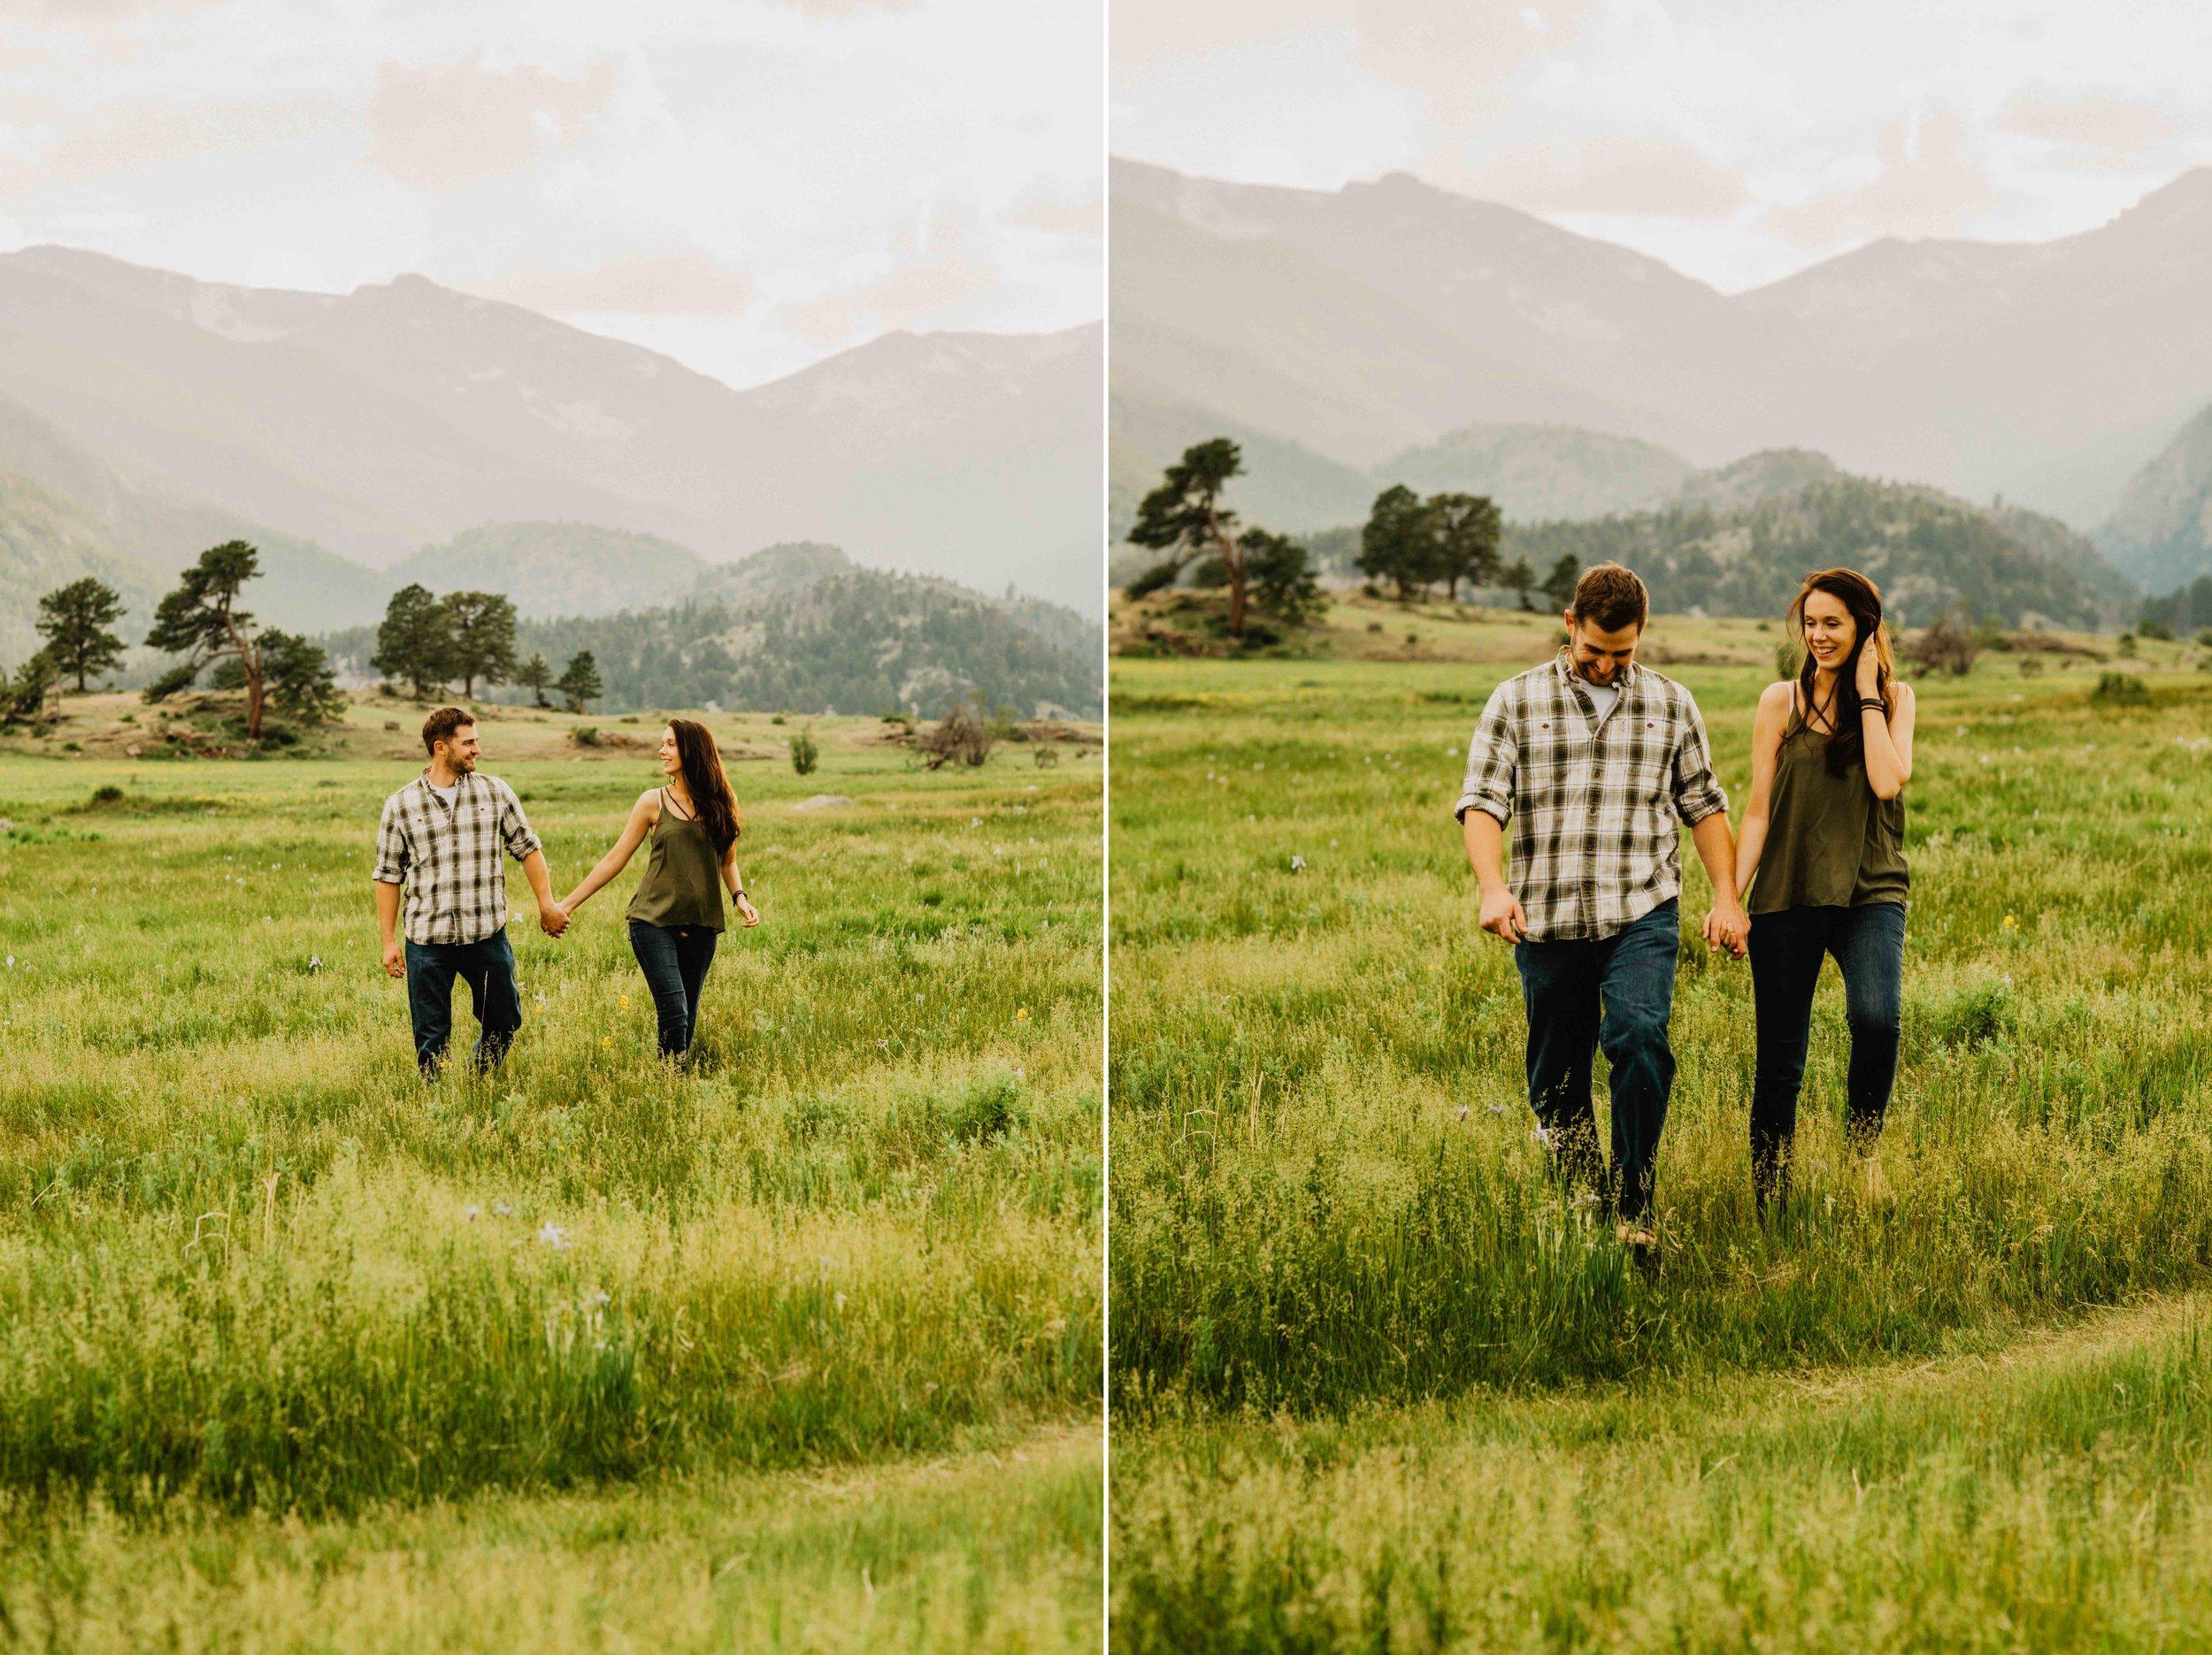 -colorado-wedding-photographer-denver-springs-vail-607A4558 copy.jpeg